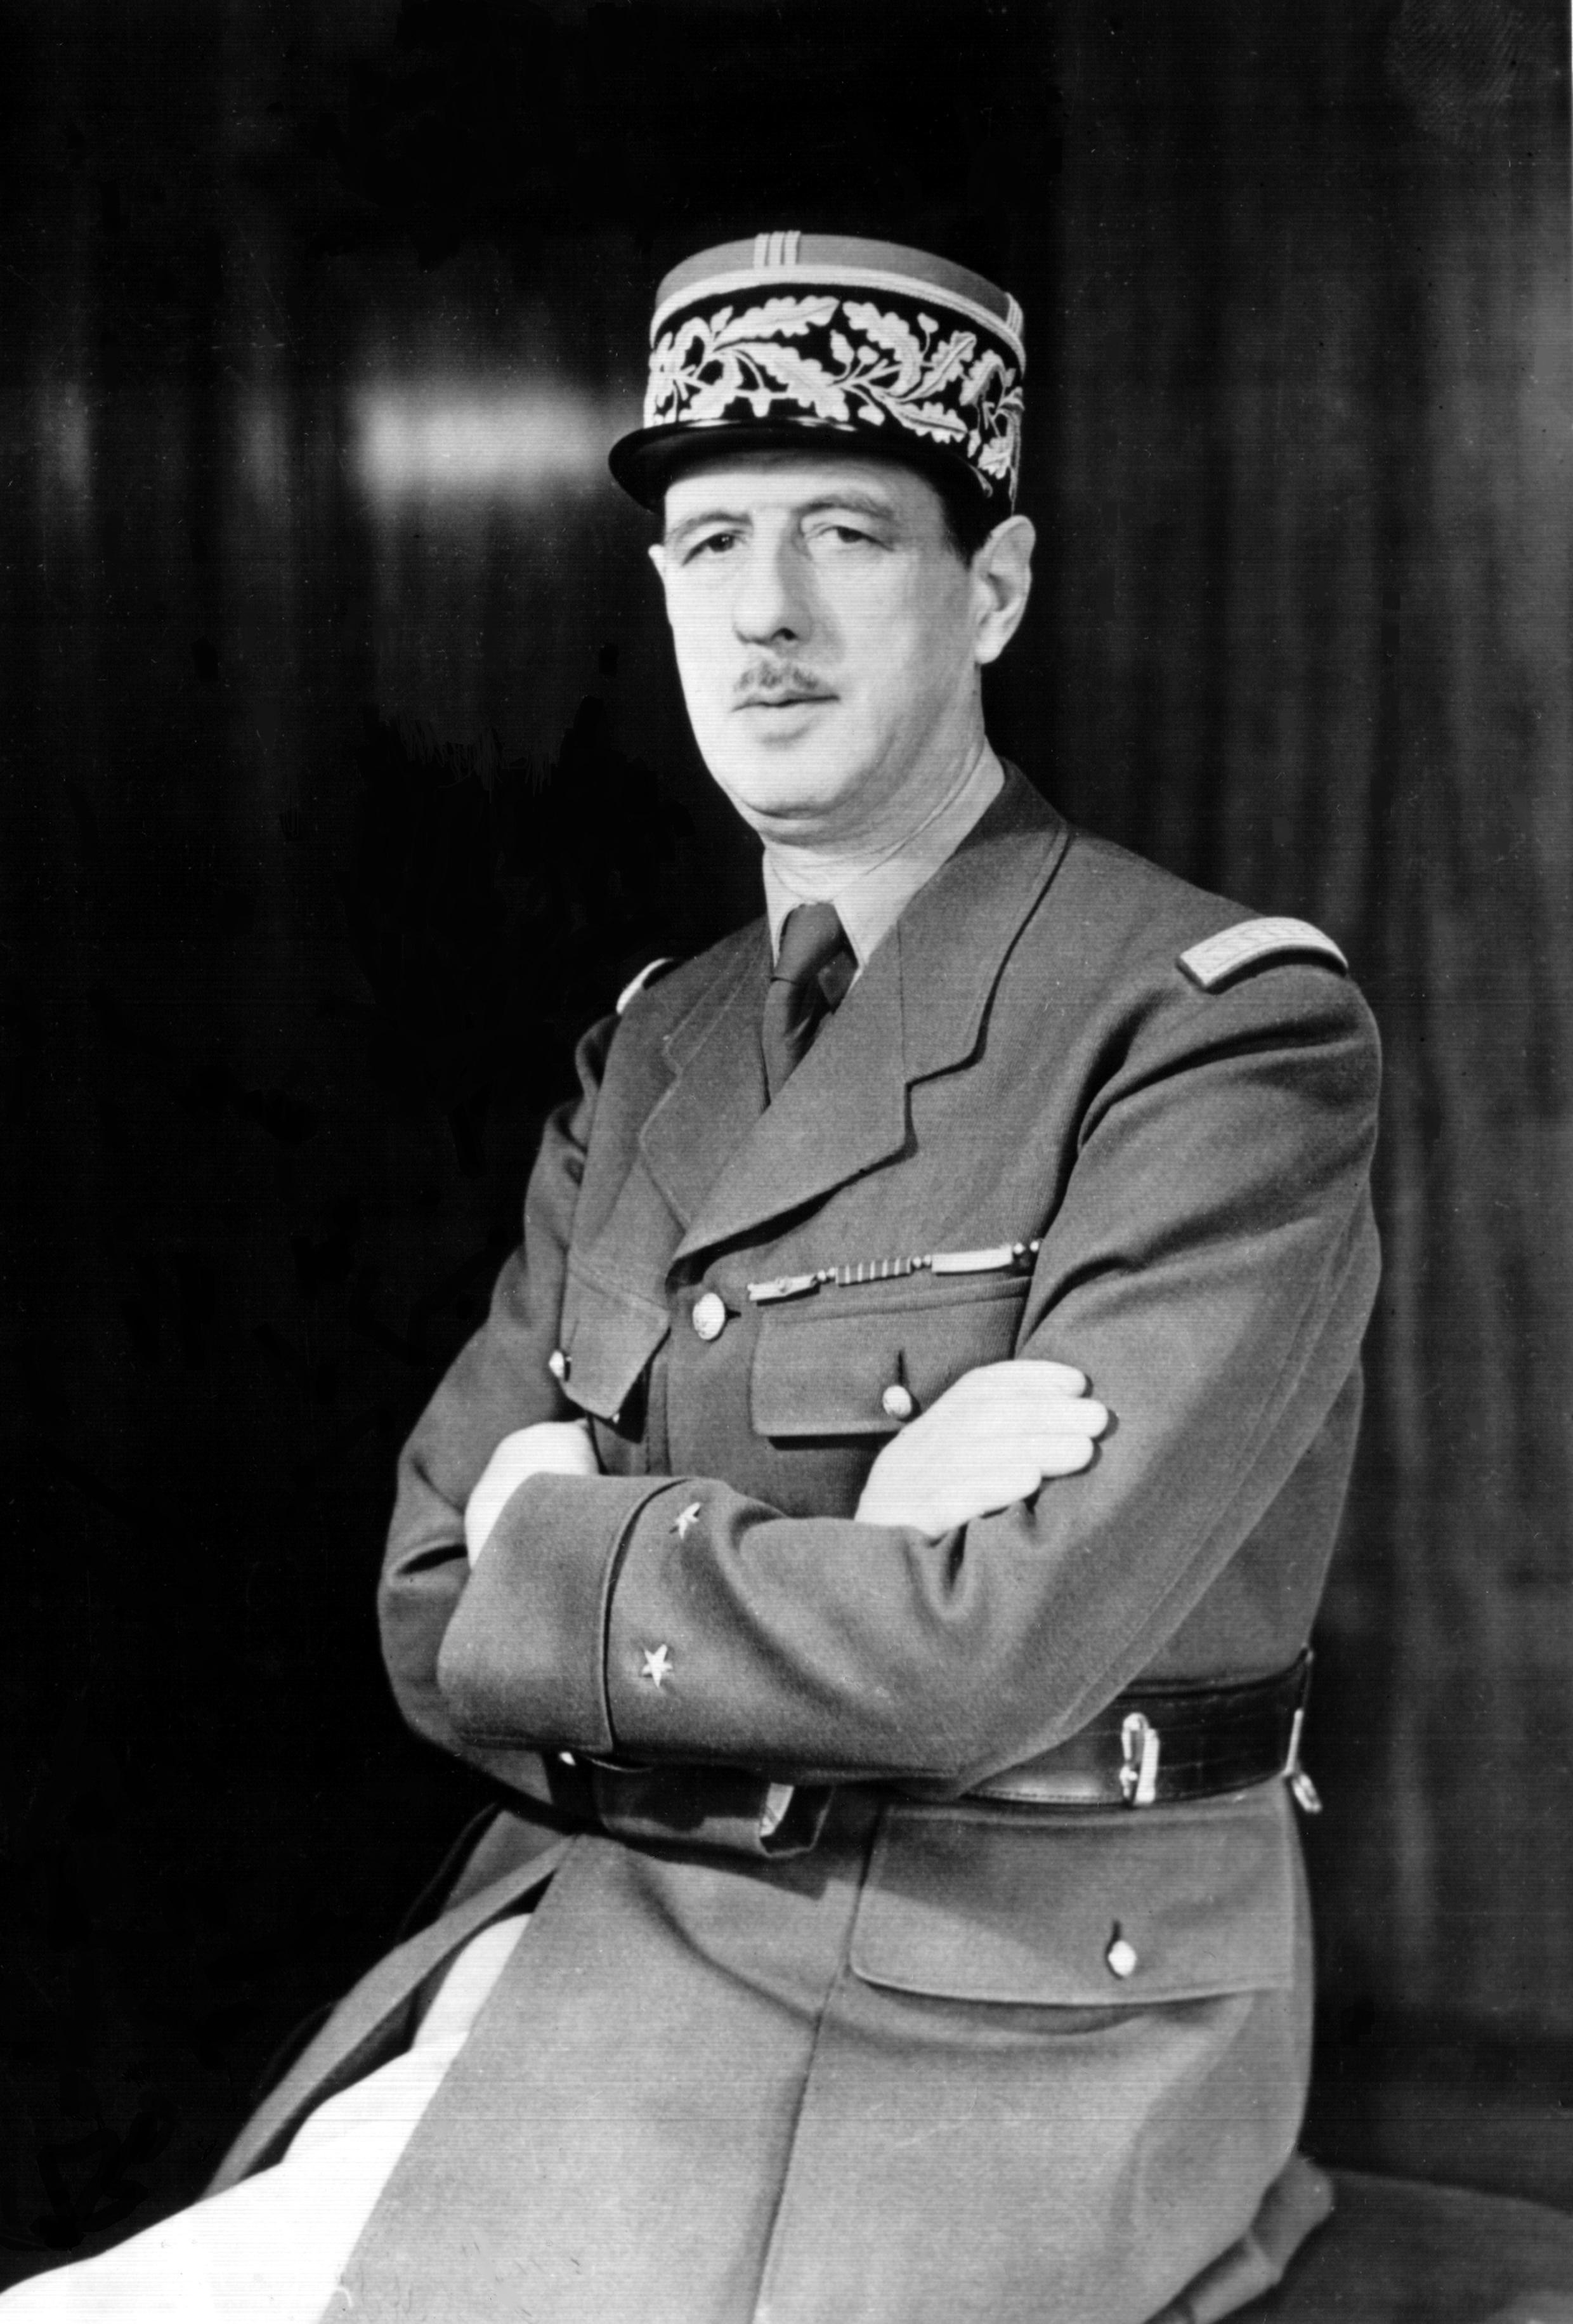 European Union: Discussion Thread De_Gaulle-OWI